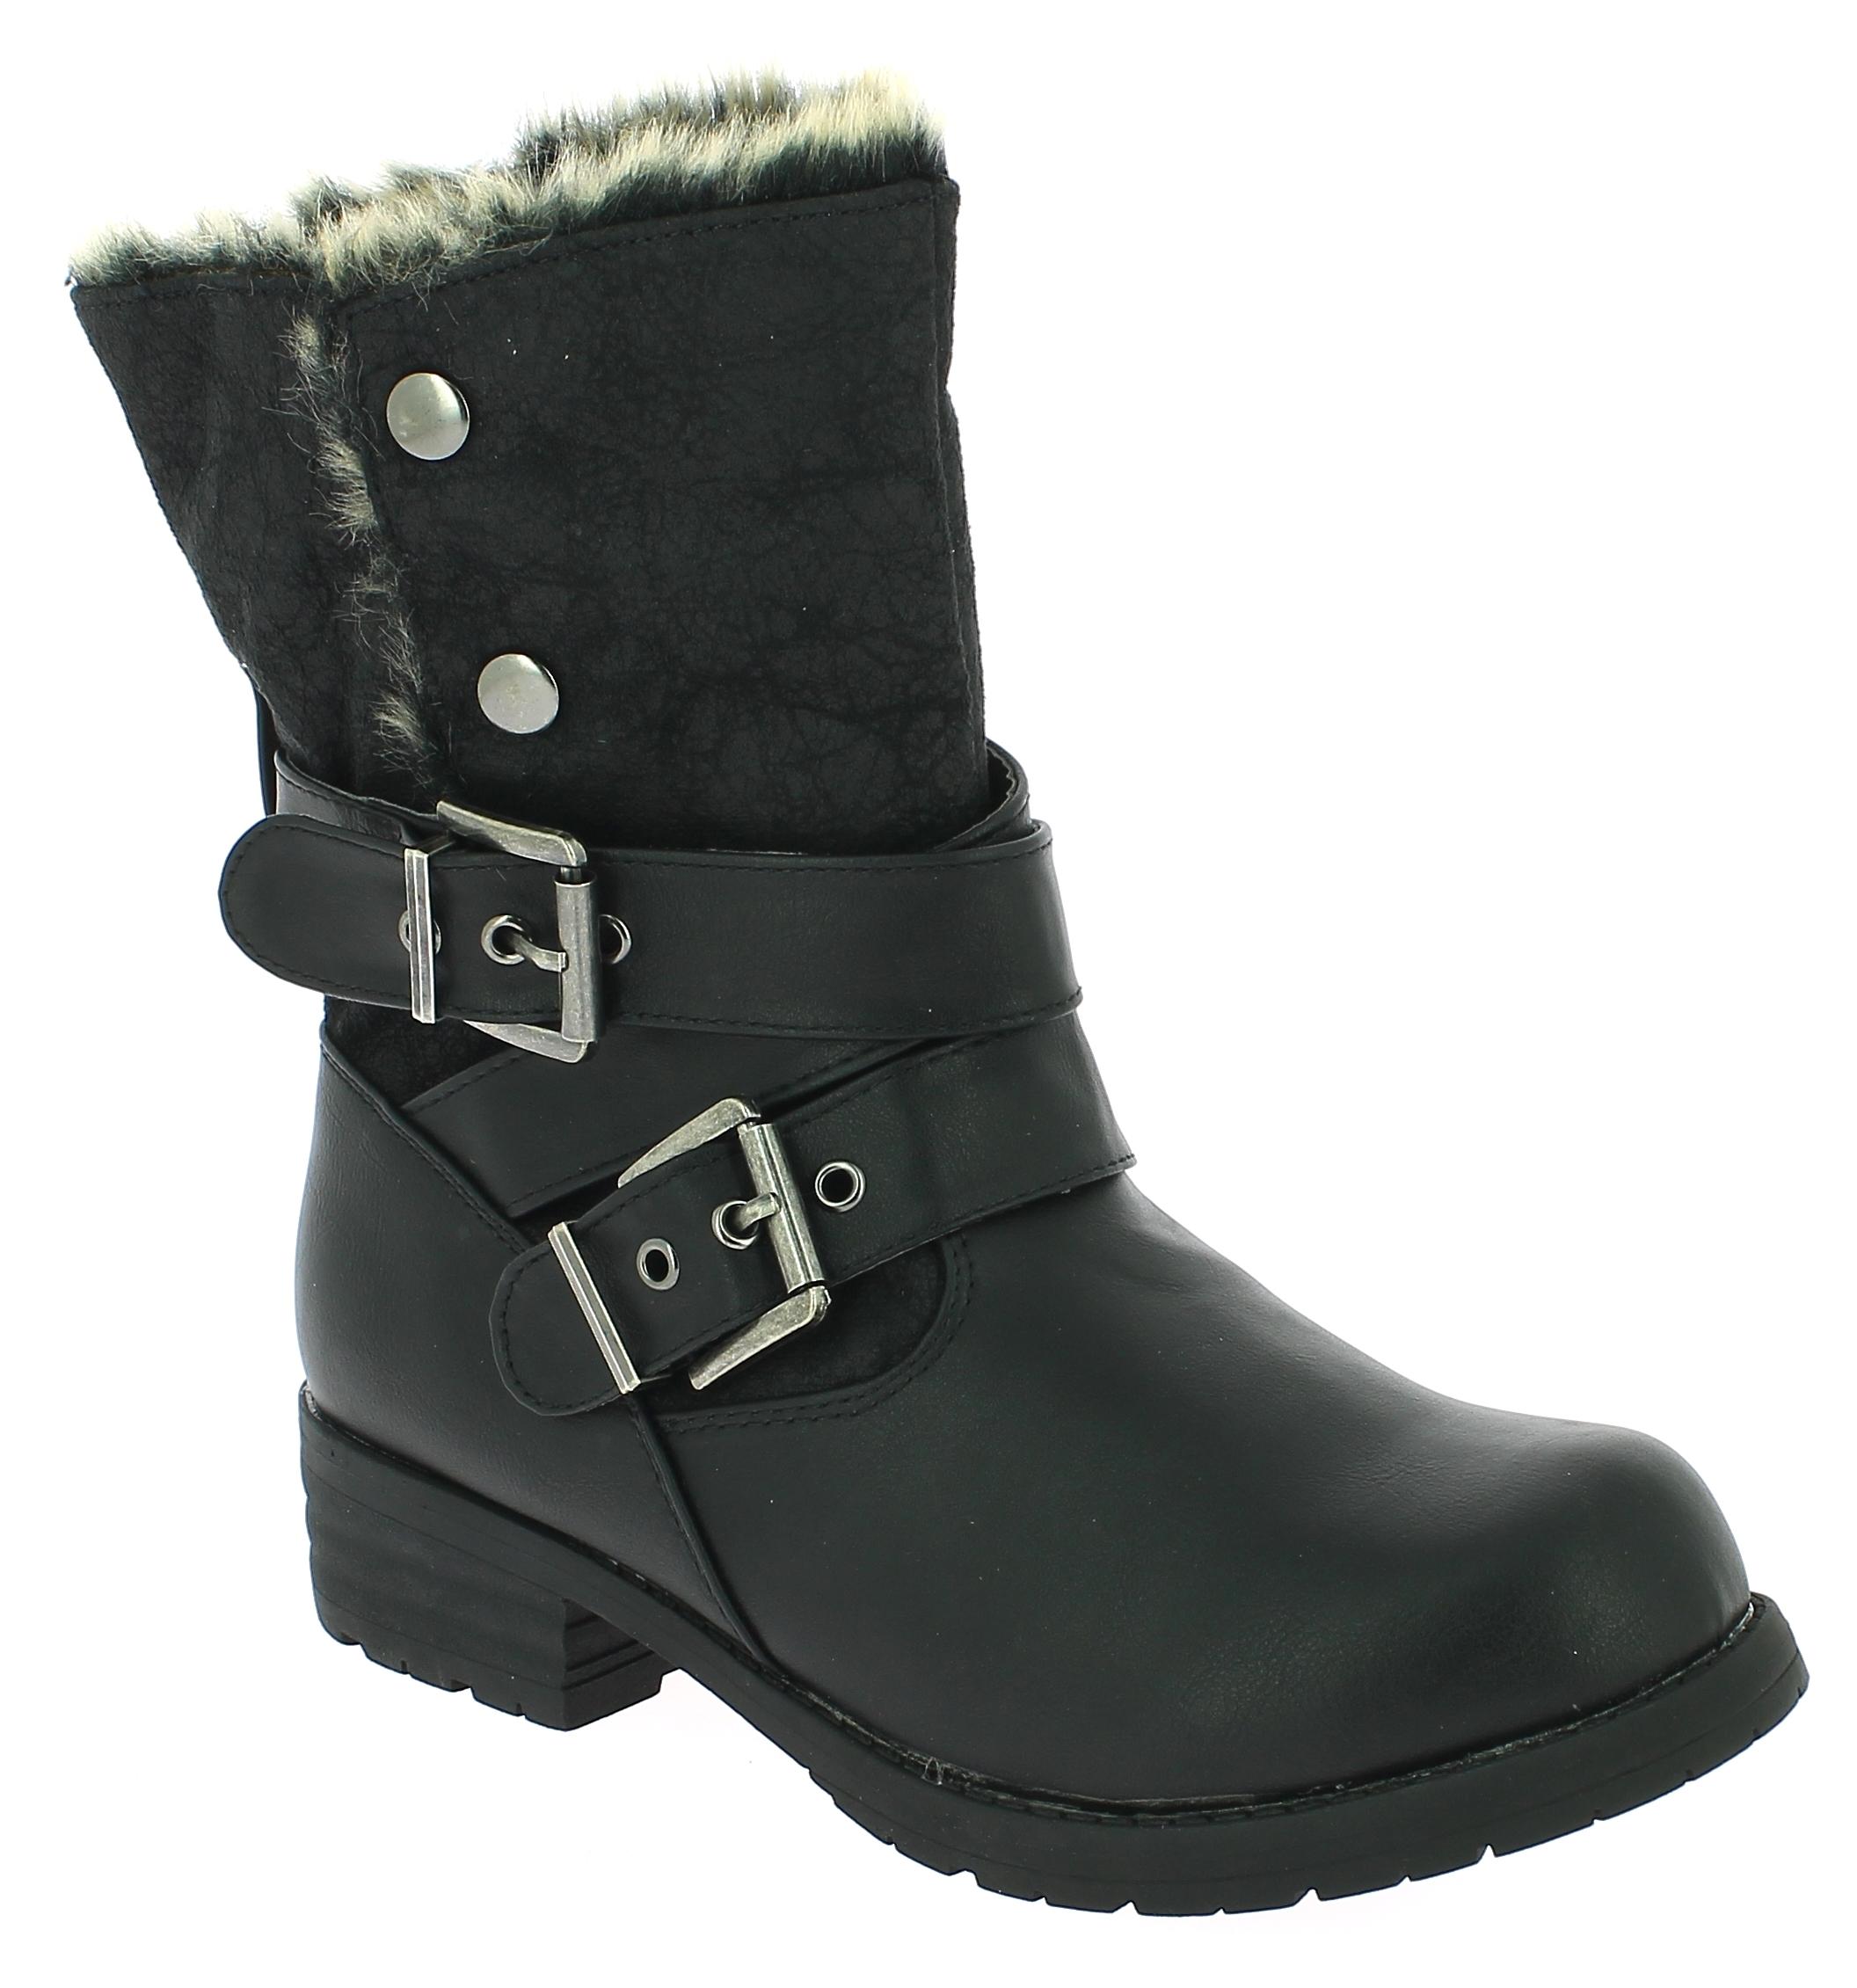 IQSHOES Γυναικείο Μποτάκι 2374202 Μαύρο - IqShoes - 2.374202 BLACK-black-37/1/15  week s best seller